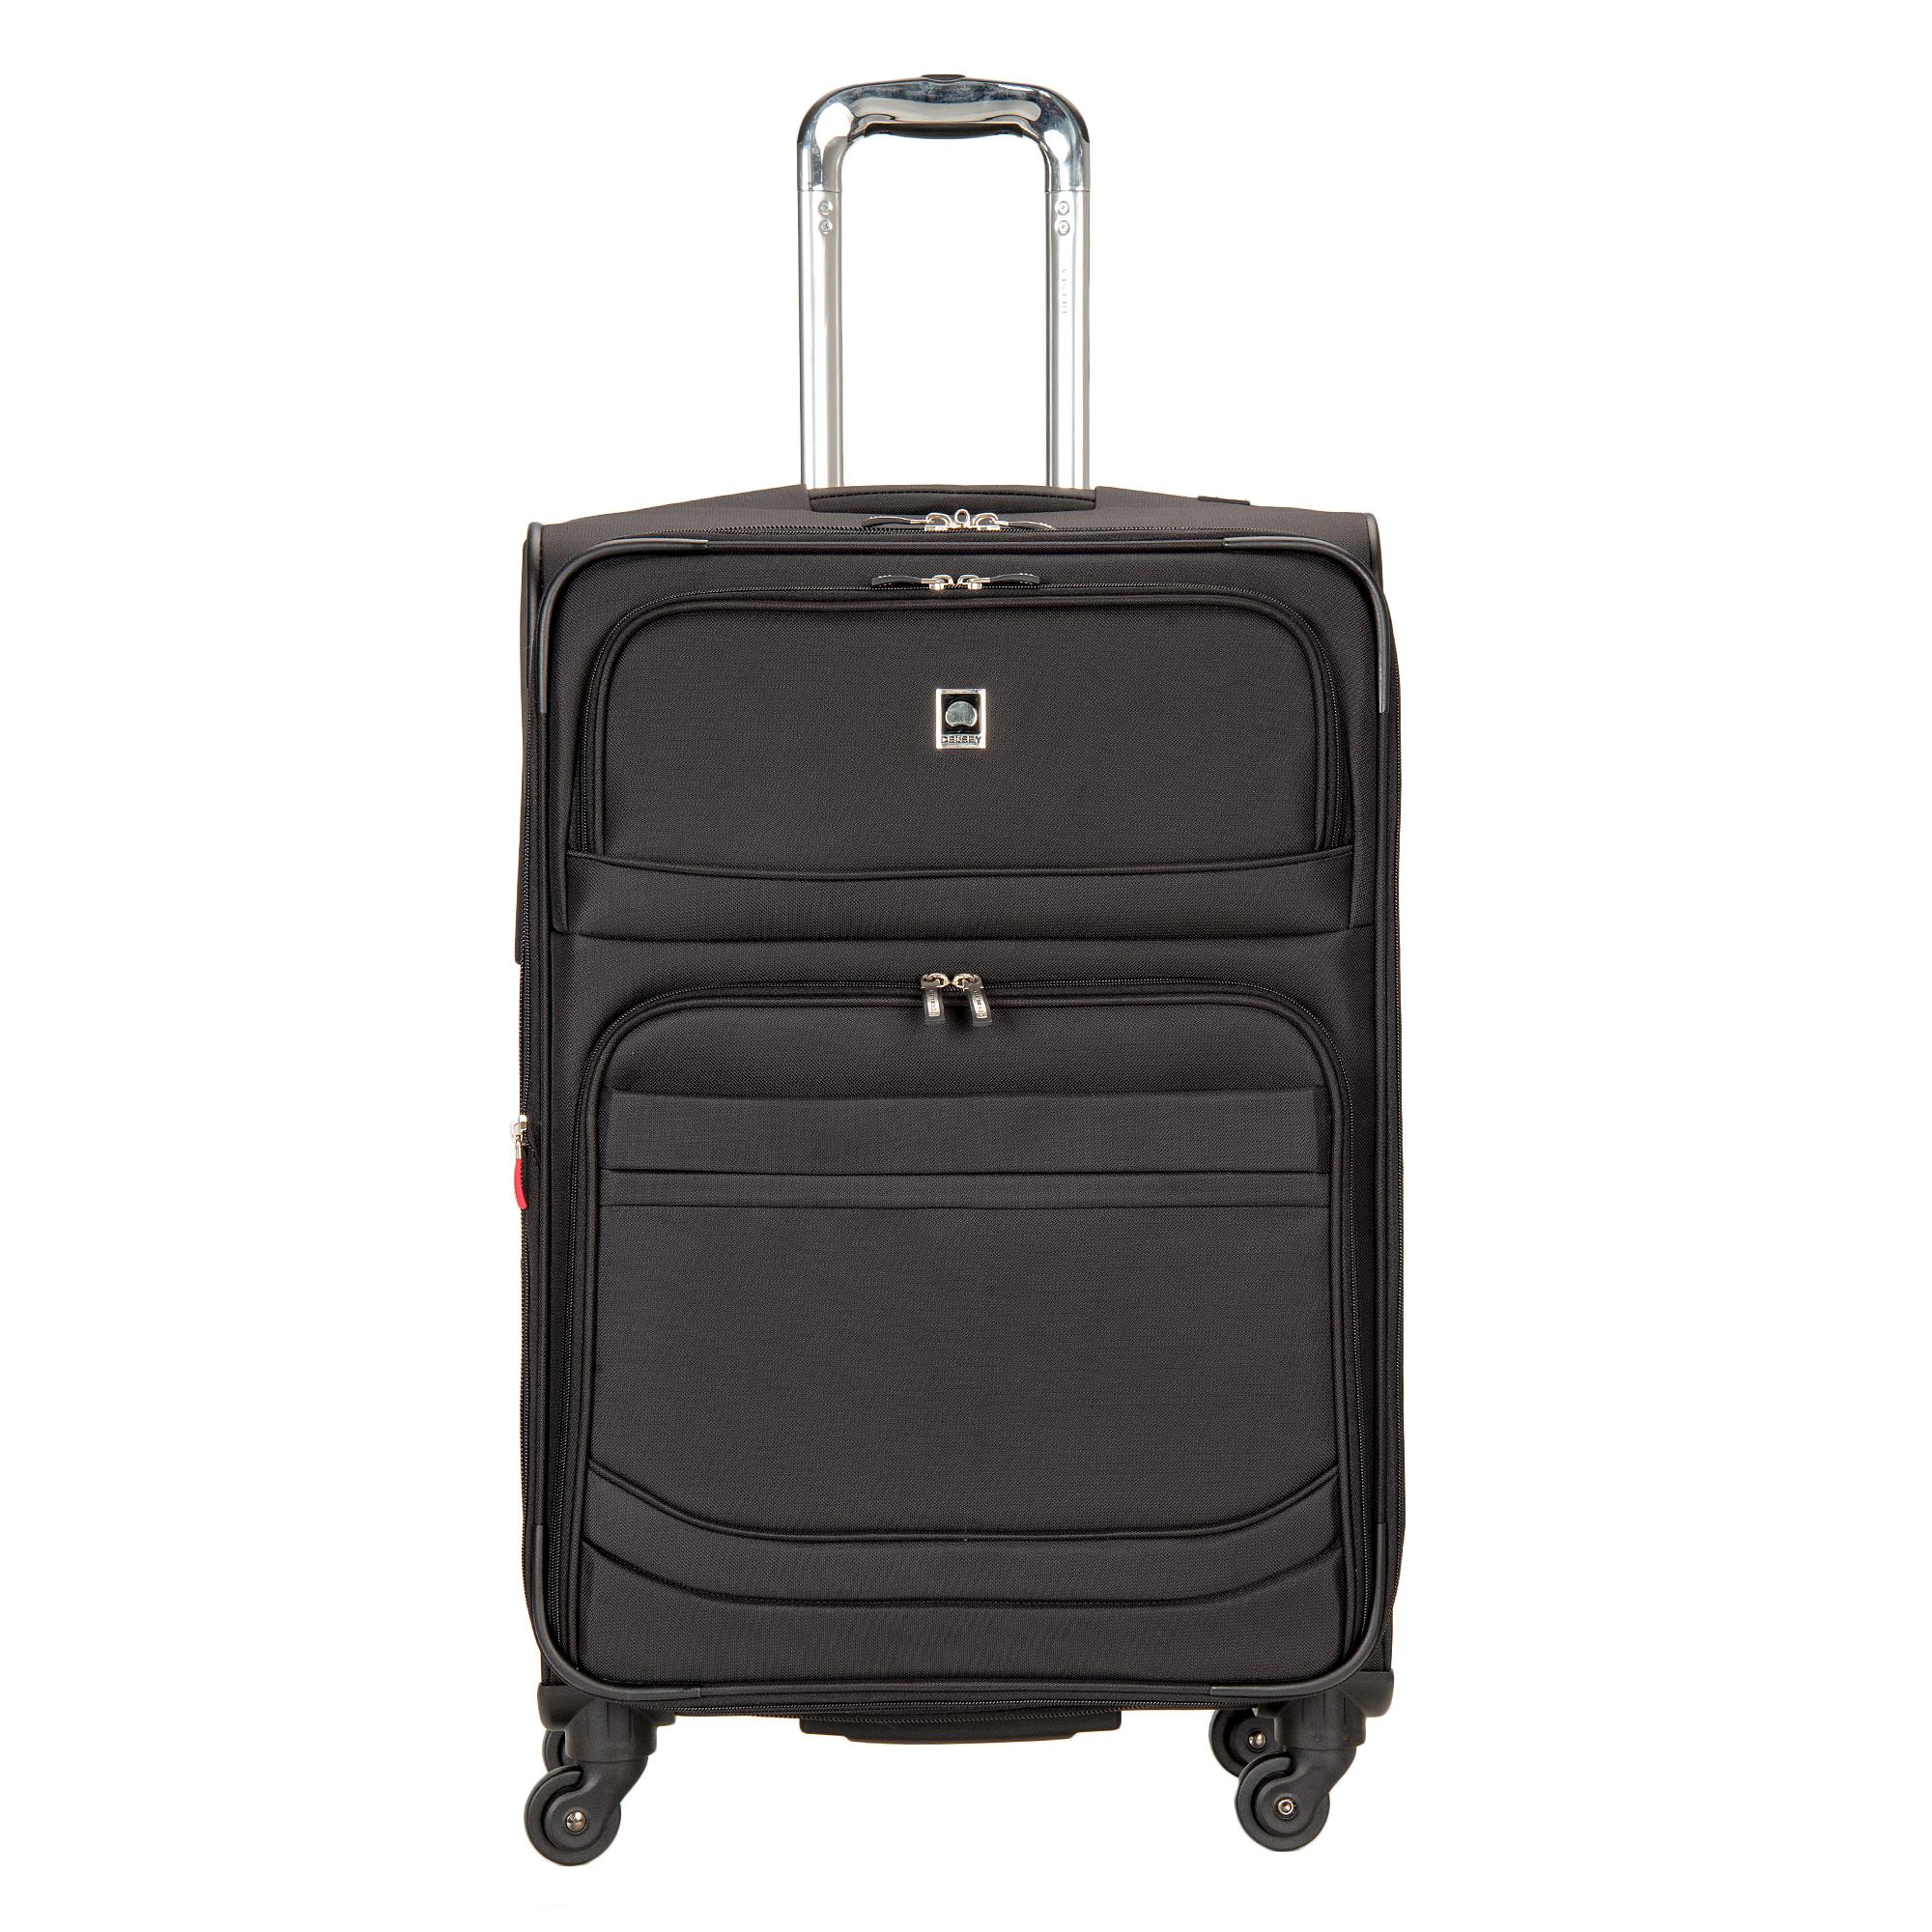 delsey luggage d lite 3 piece expandable nested spinner luggage set ebay. Black Bedroom Furniture Sets. Home Design Ideas